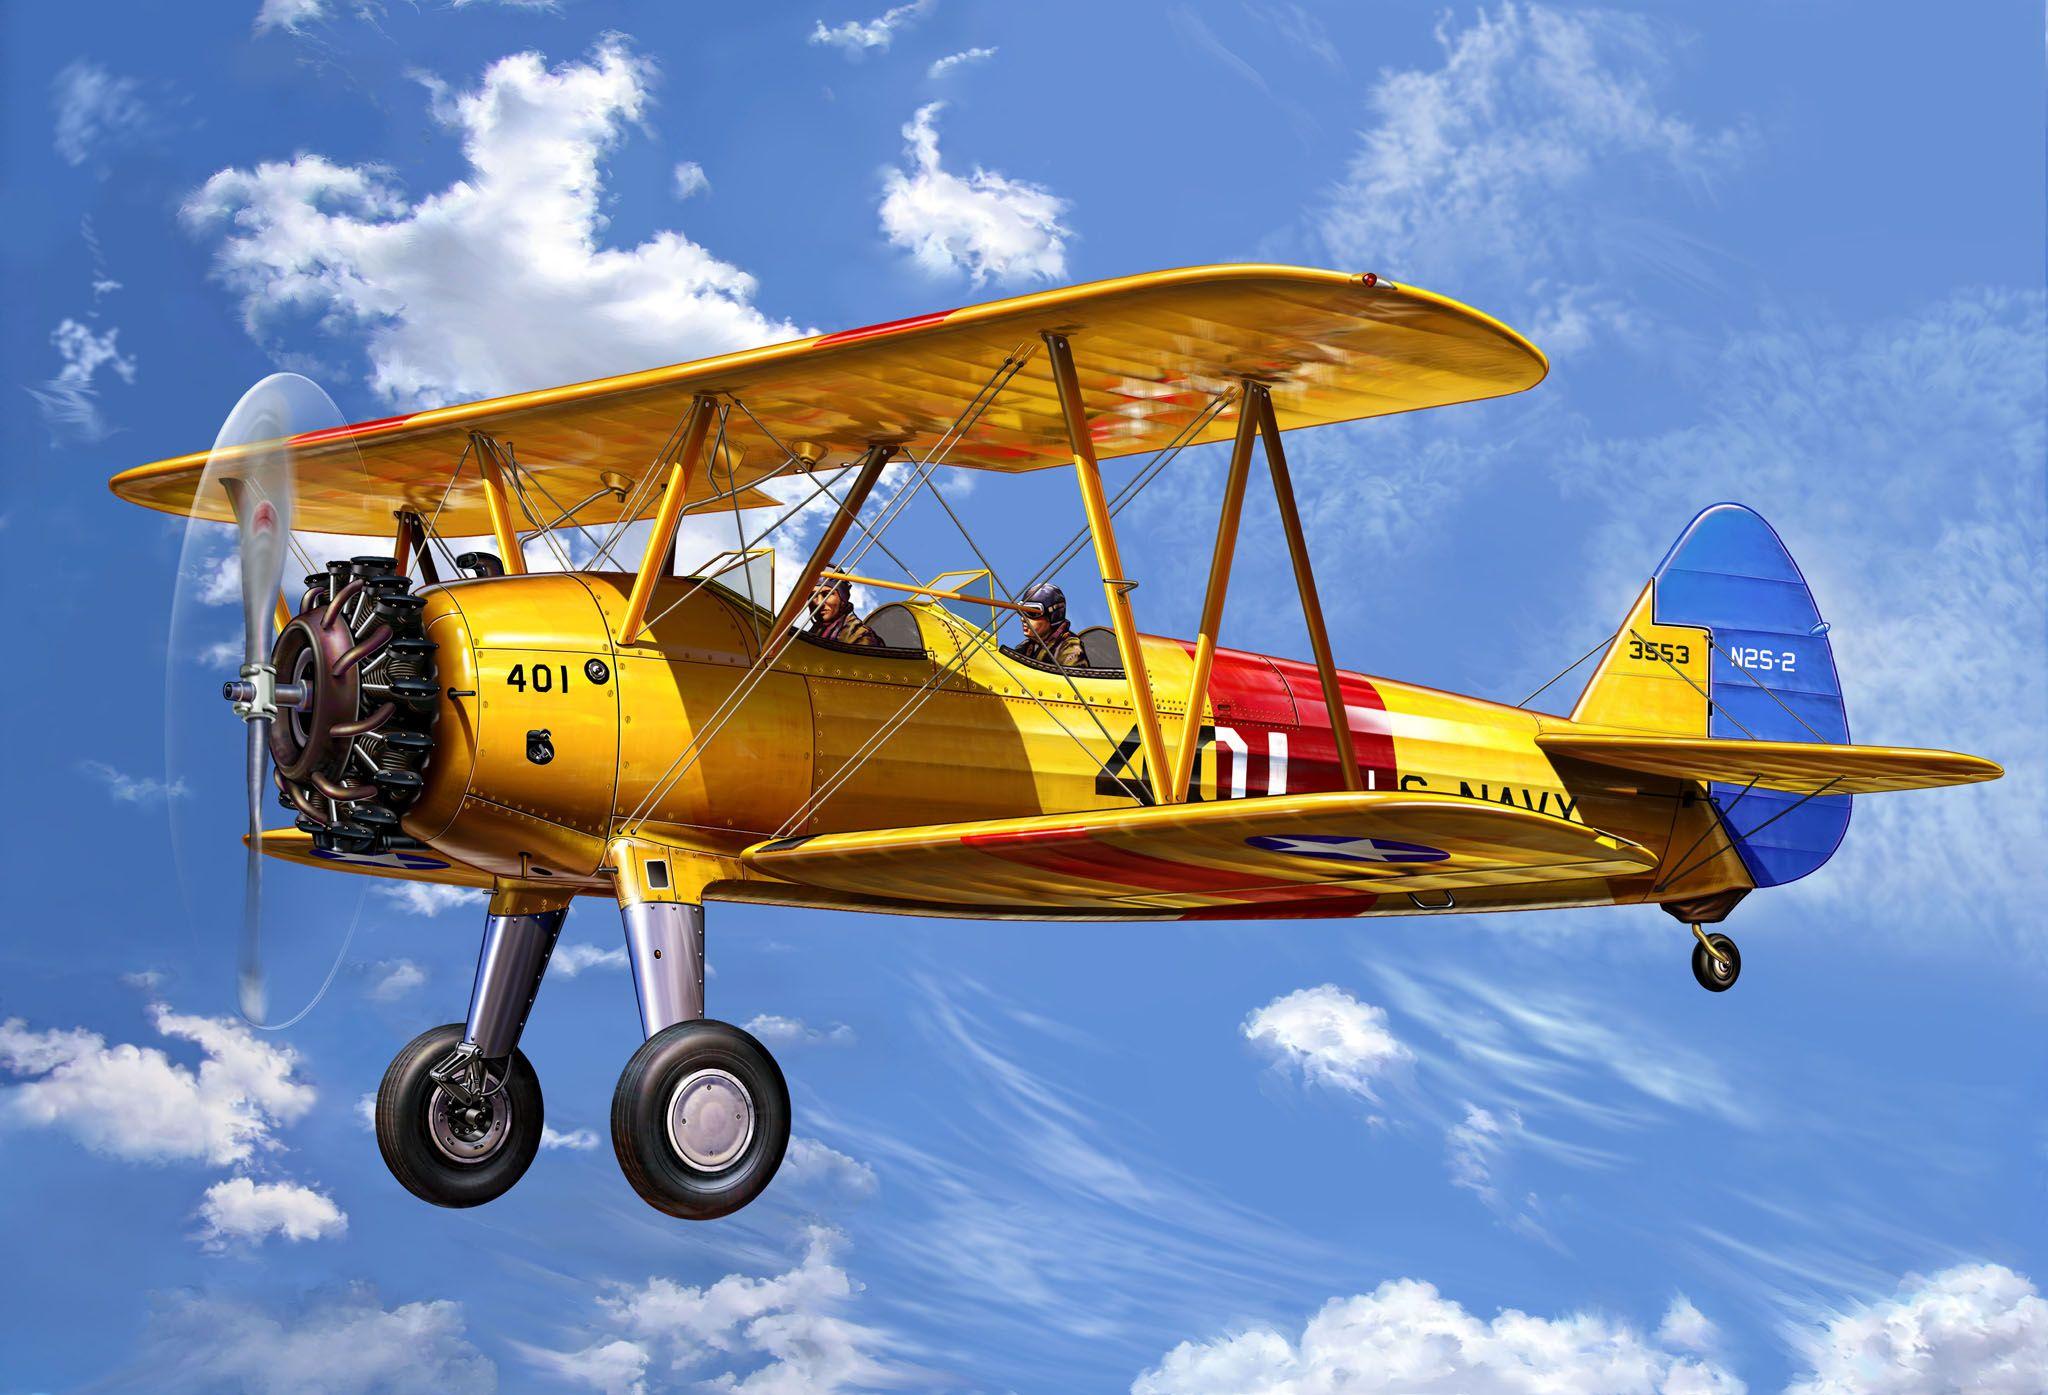 Biplane History Aircraft Model Airplanes Kit Biplane